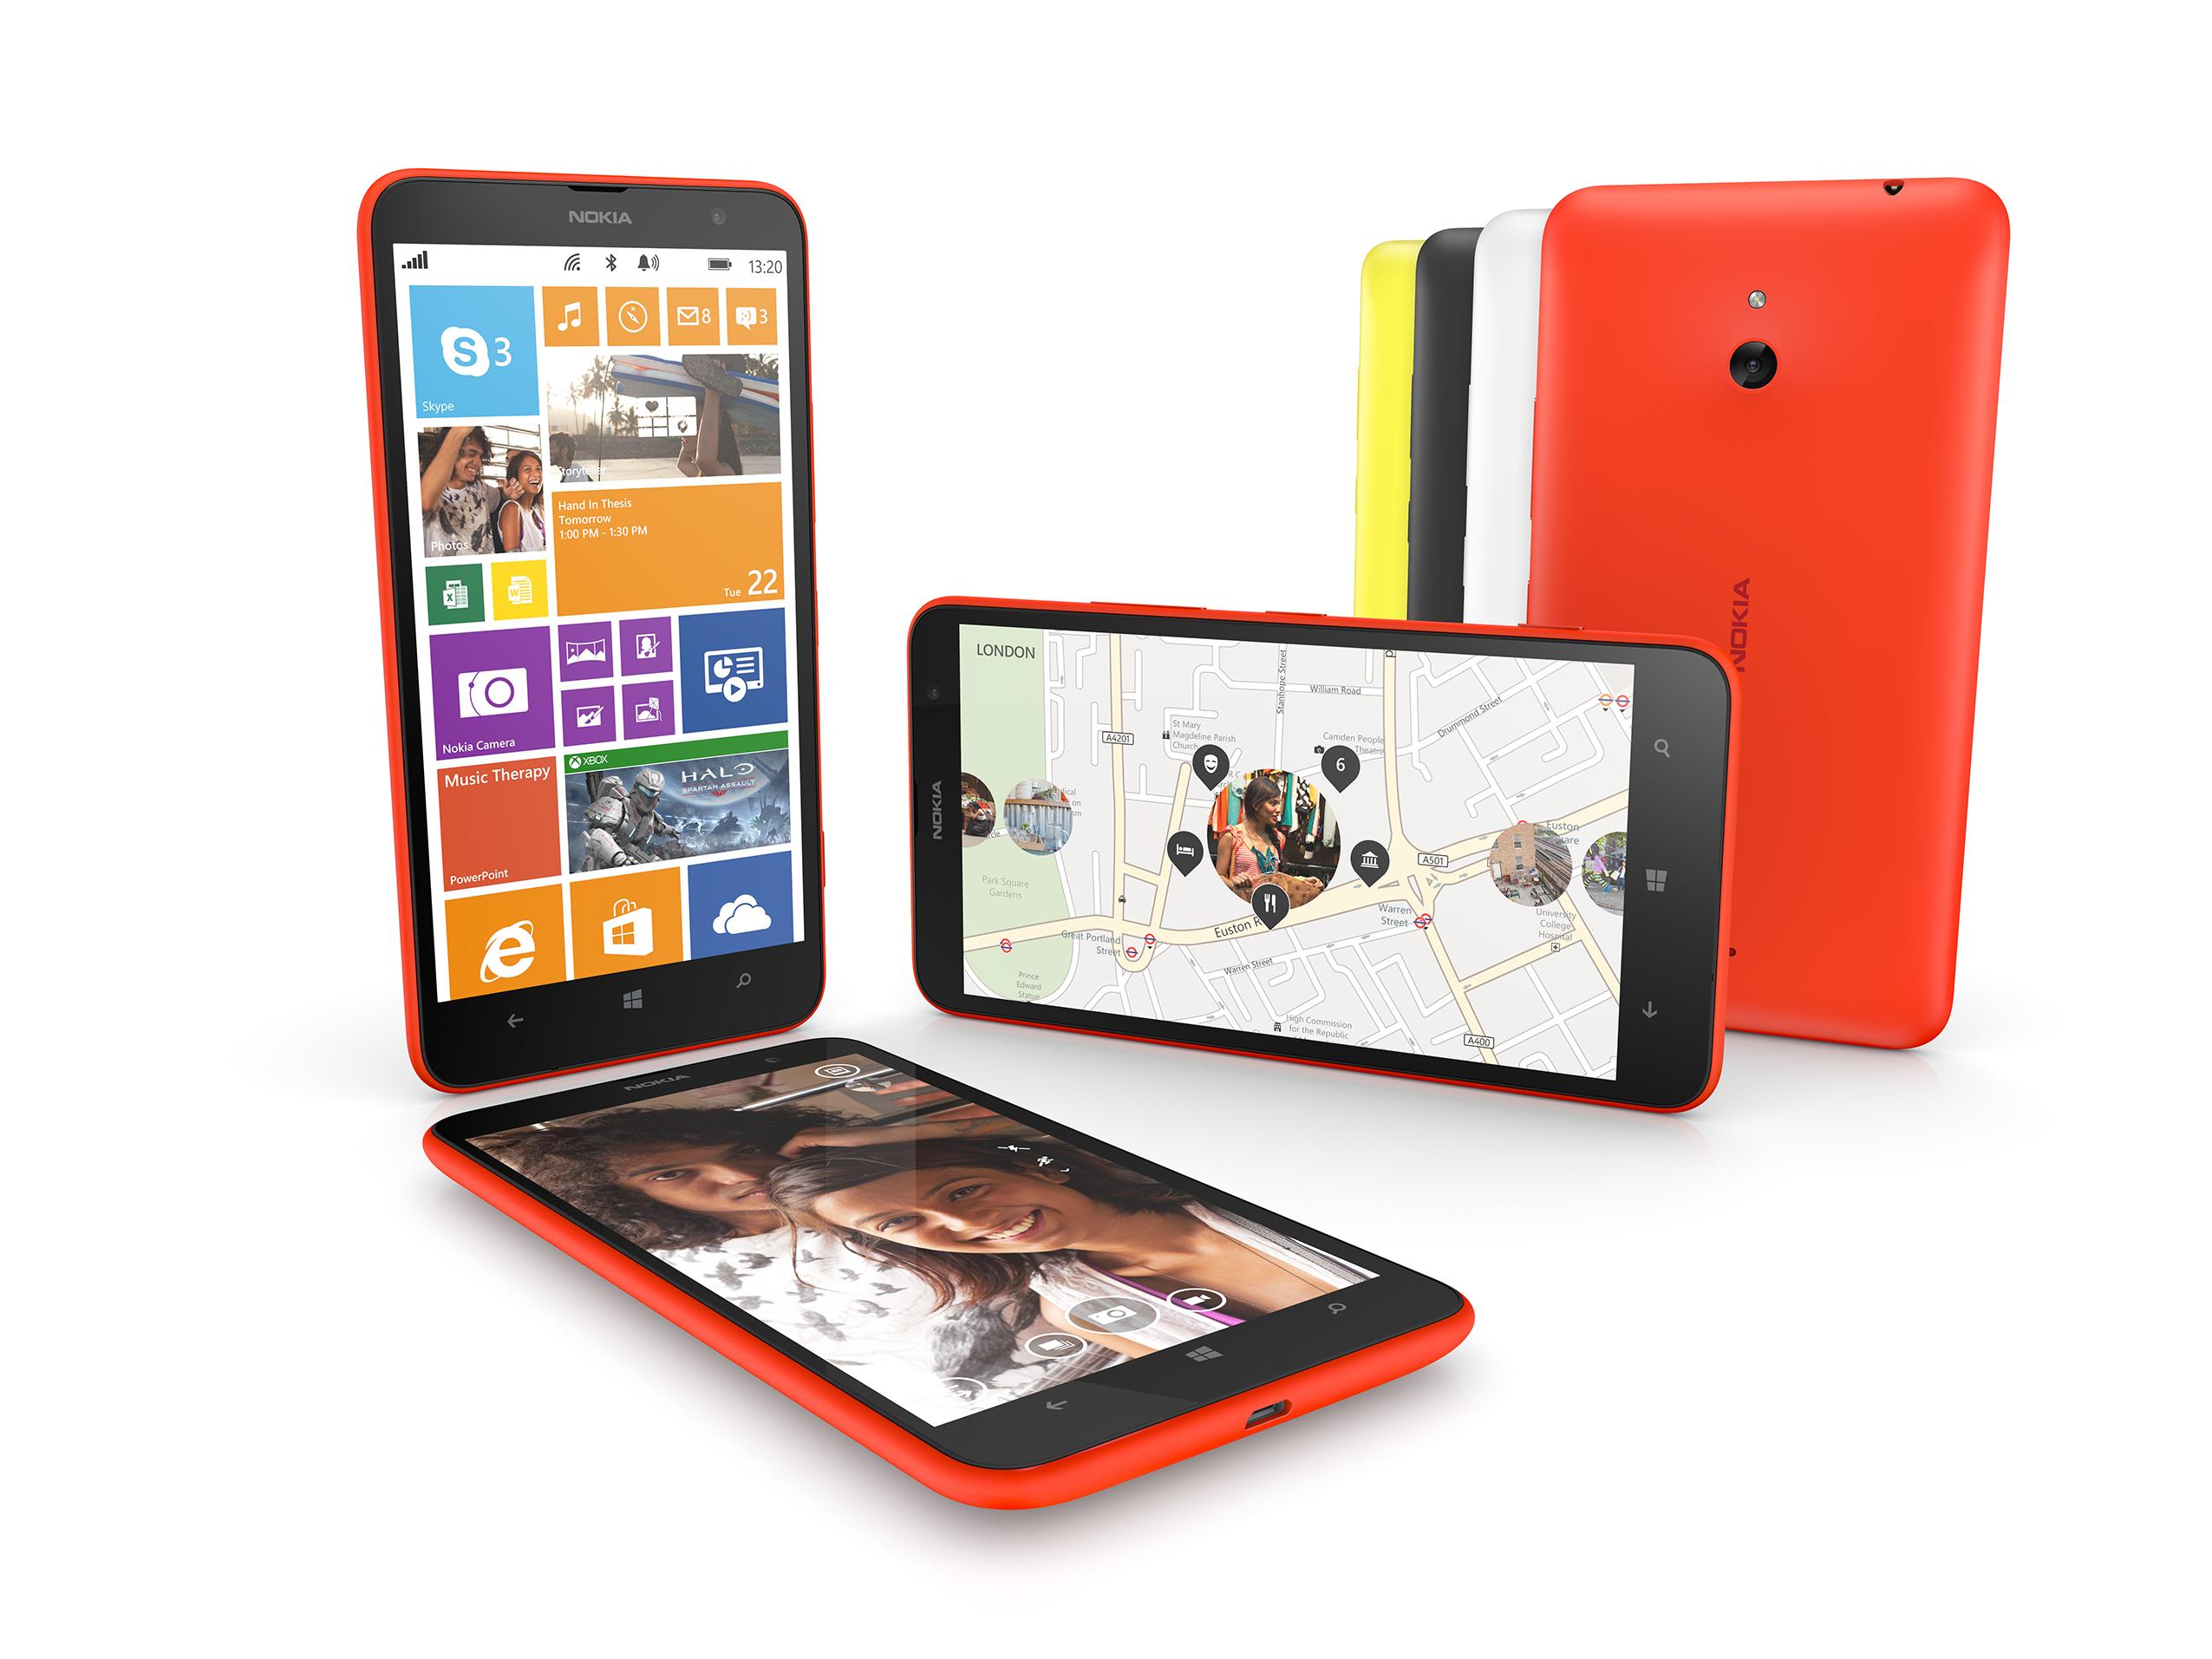 Telefony Lumia pod marką Microsoftu